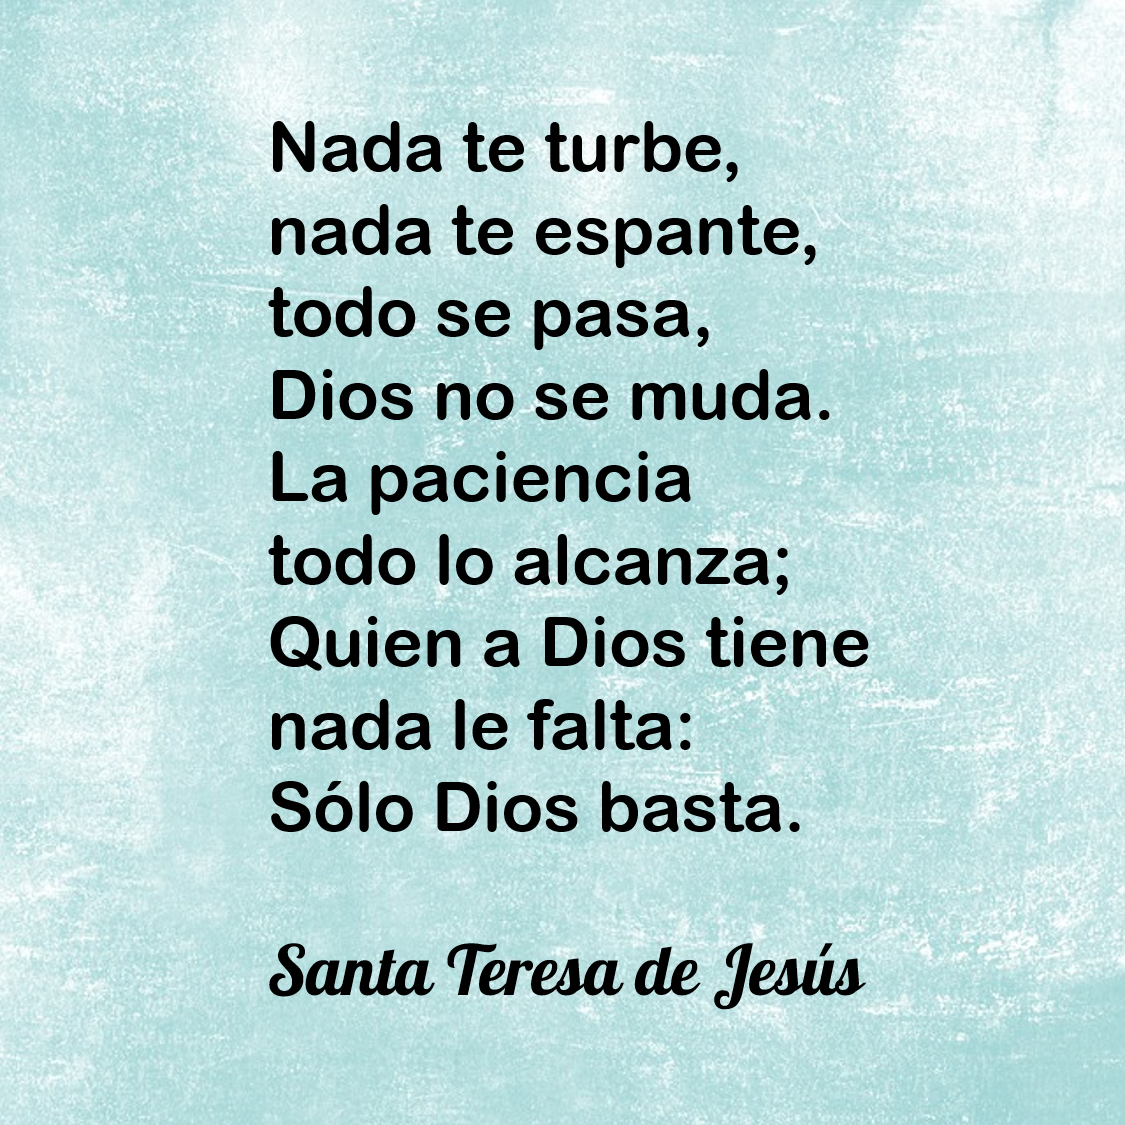 Pan Para El Espíritu Poema Nada Te Turbe Santa Teresa De Jesús